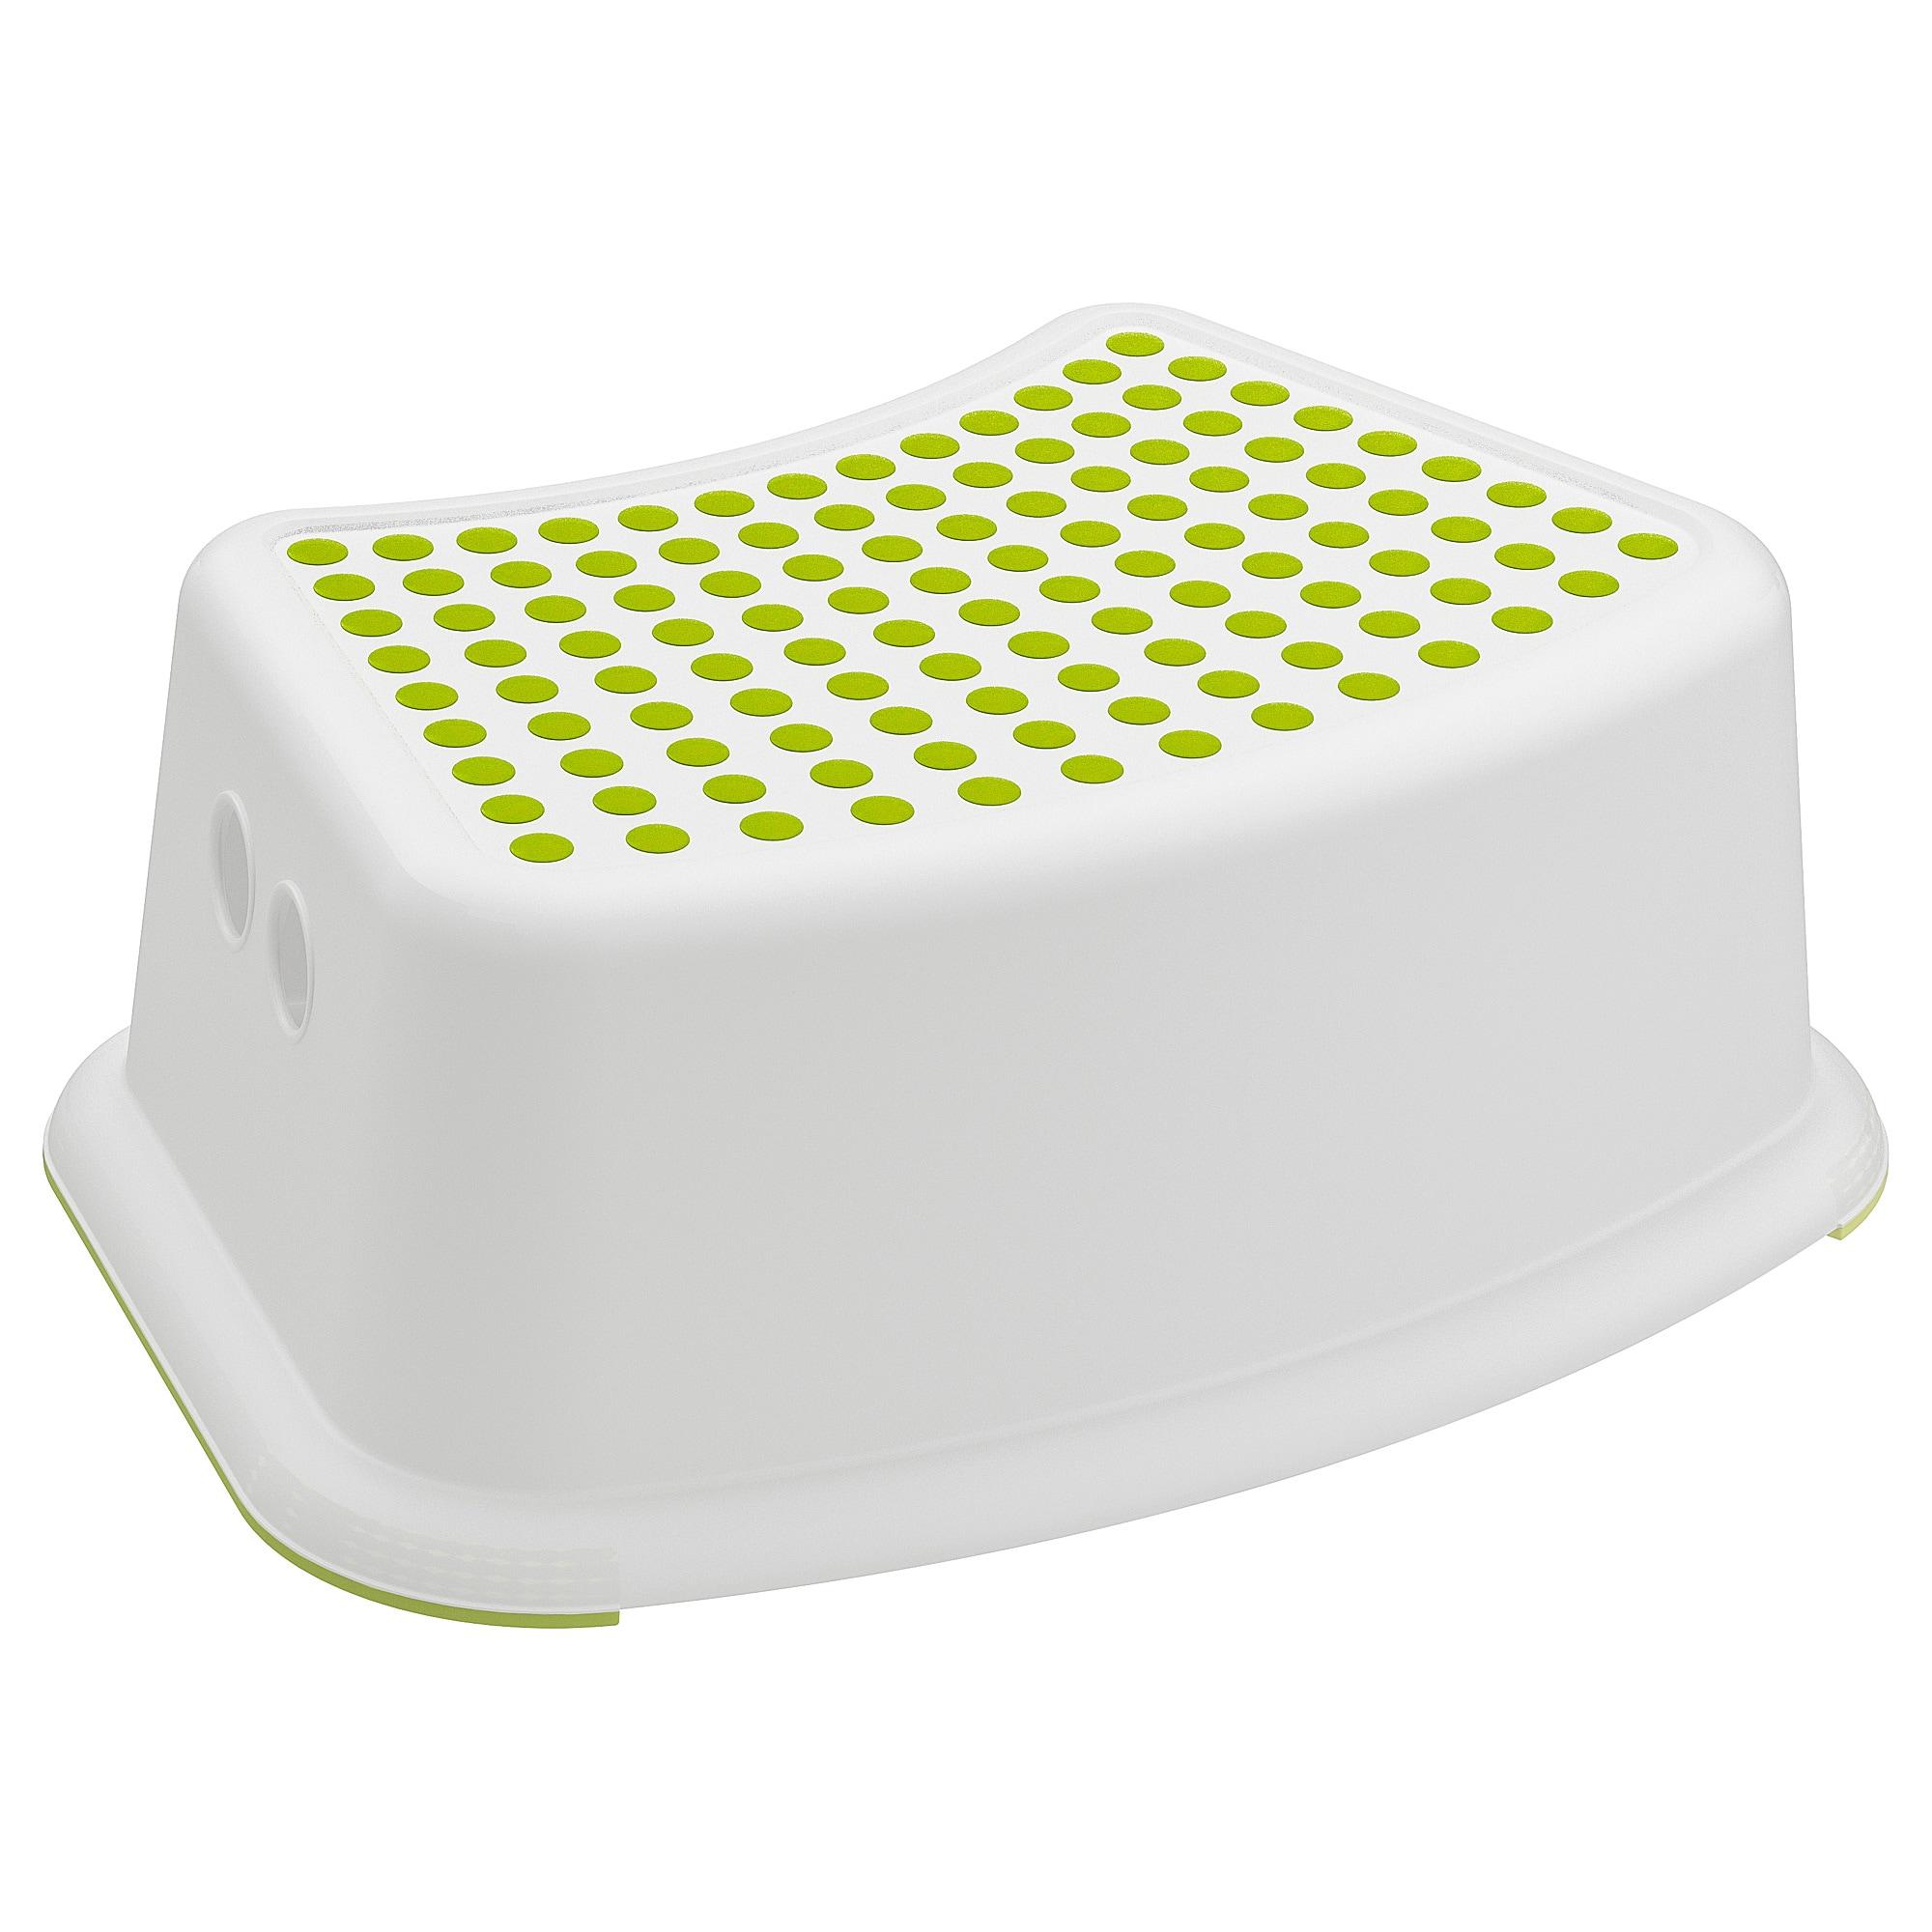 Mueble Bañera Cambiador Ikea Y7du Là Ttsam Baà Era Para Bebà Blanco Verde Ikea